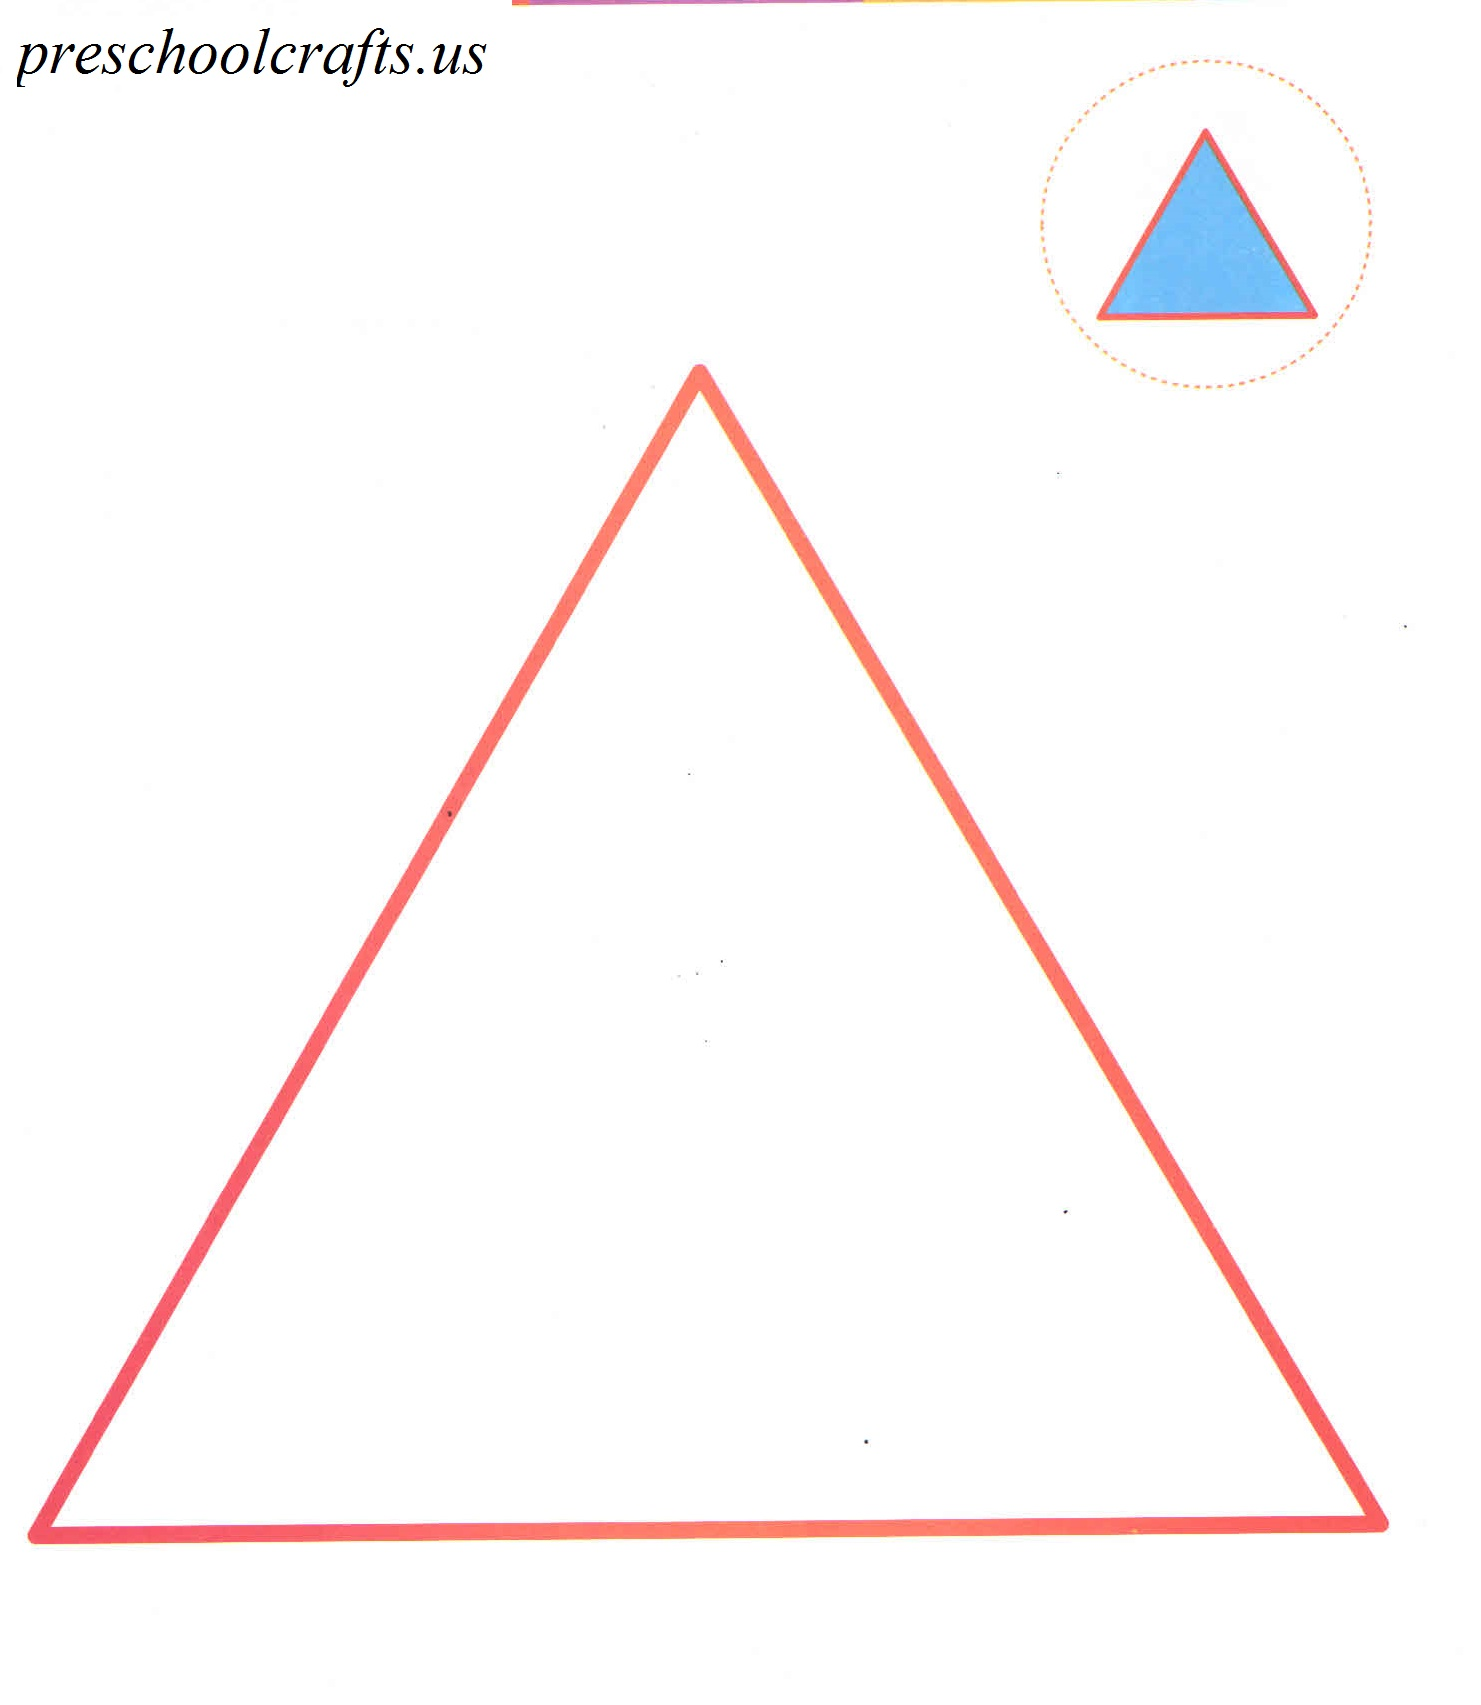 triangle coloring page - Preschool Crafts